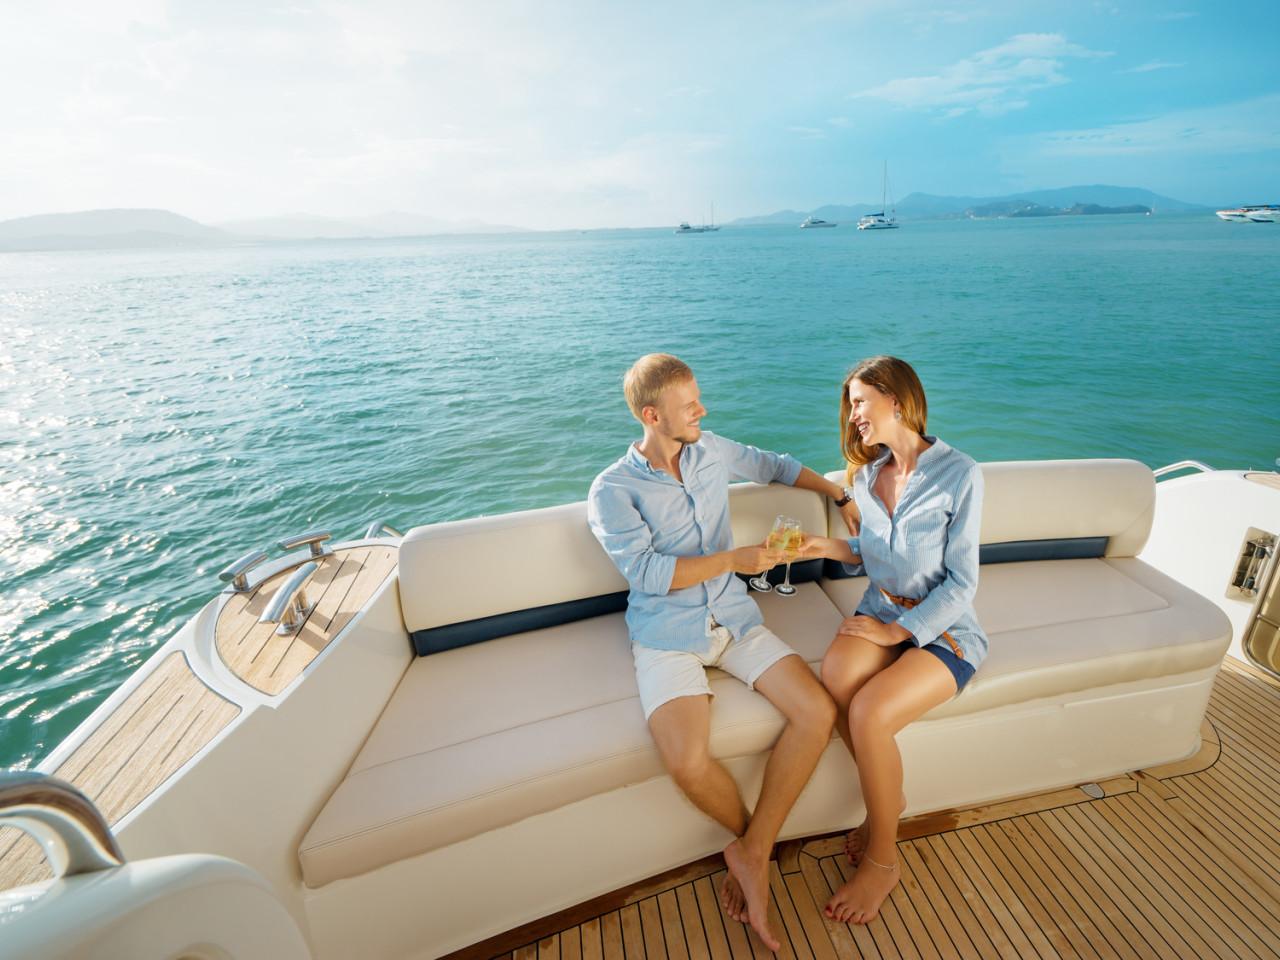 Romantic boat tour to Capri and Sorrento Coast from Sorrento | Mar Amar boat tour